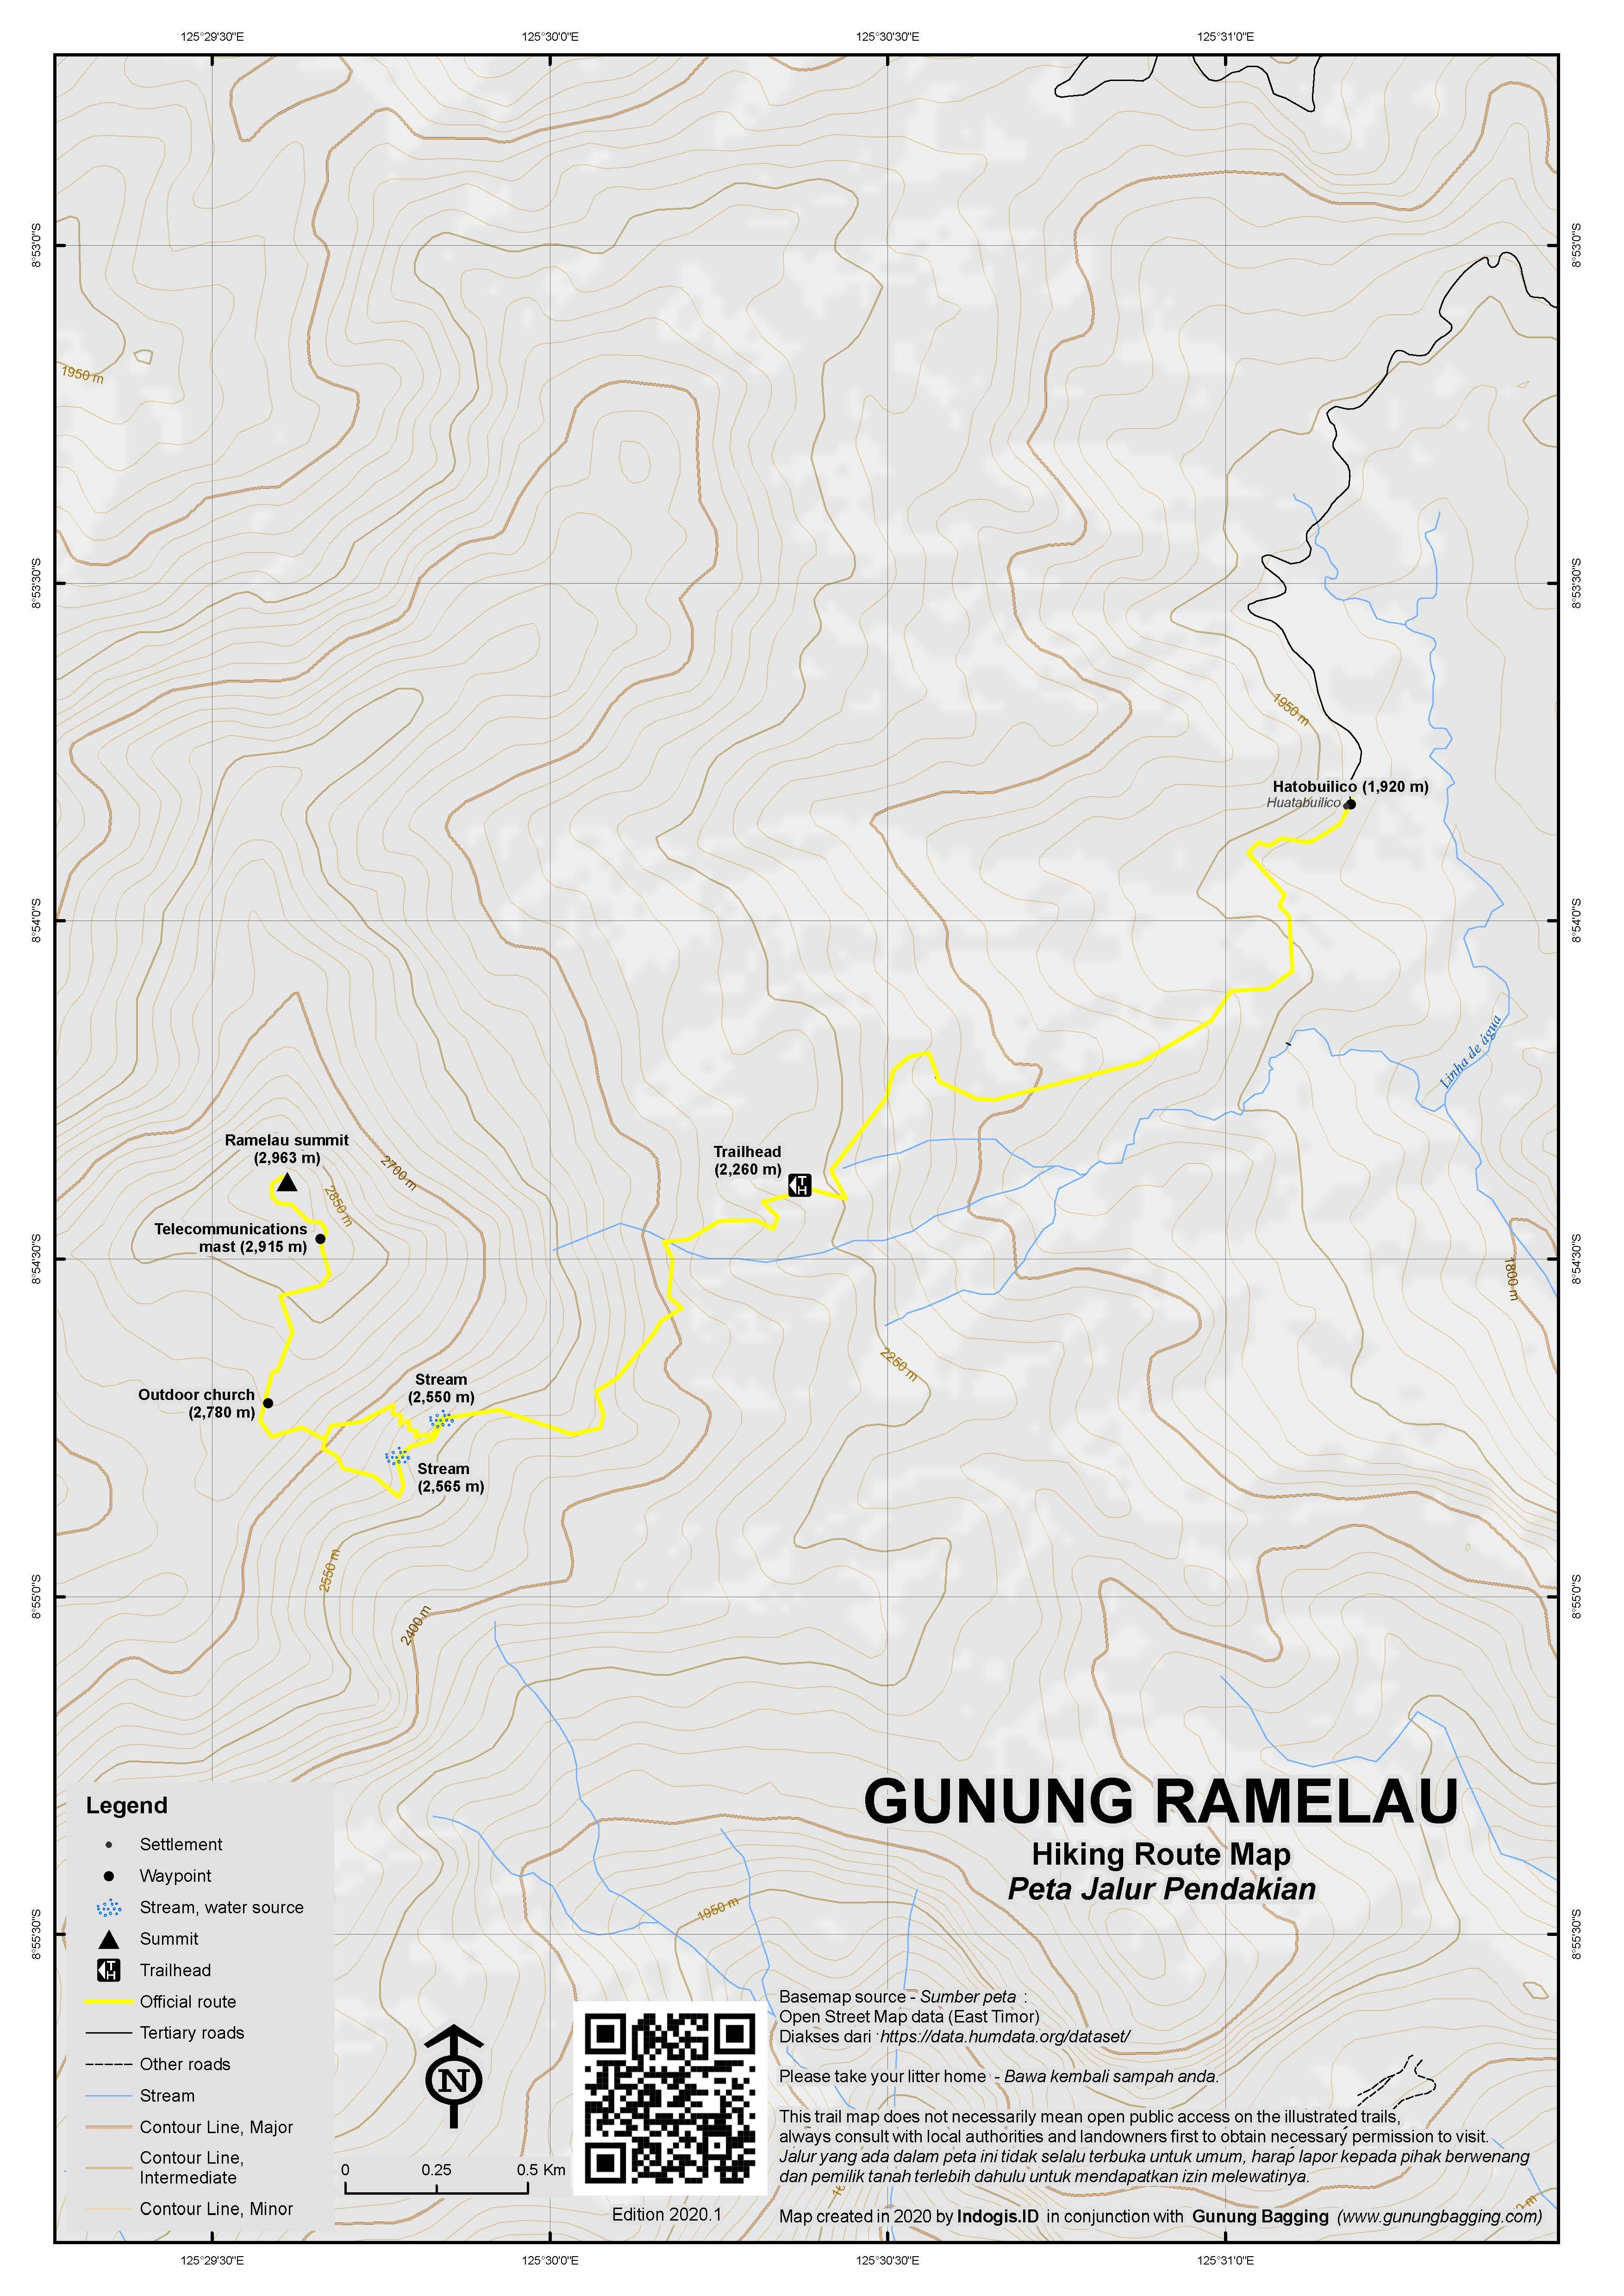 Peta Jalur Pendakian Gunung Ramelau